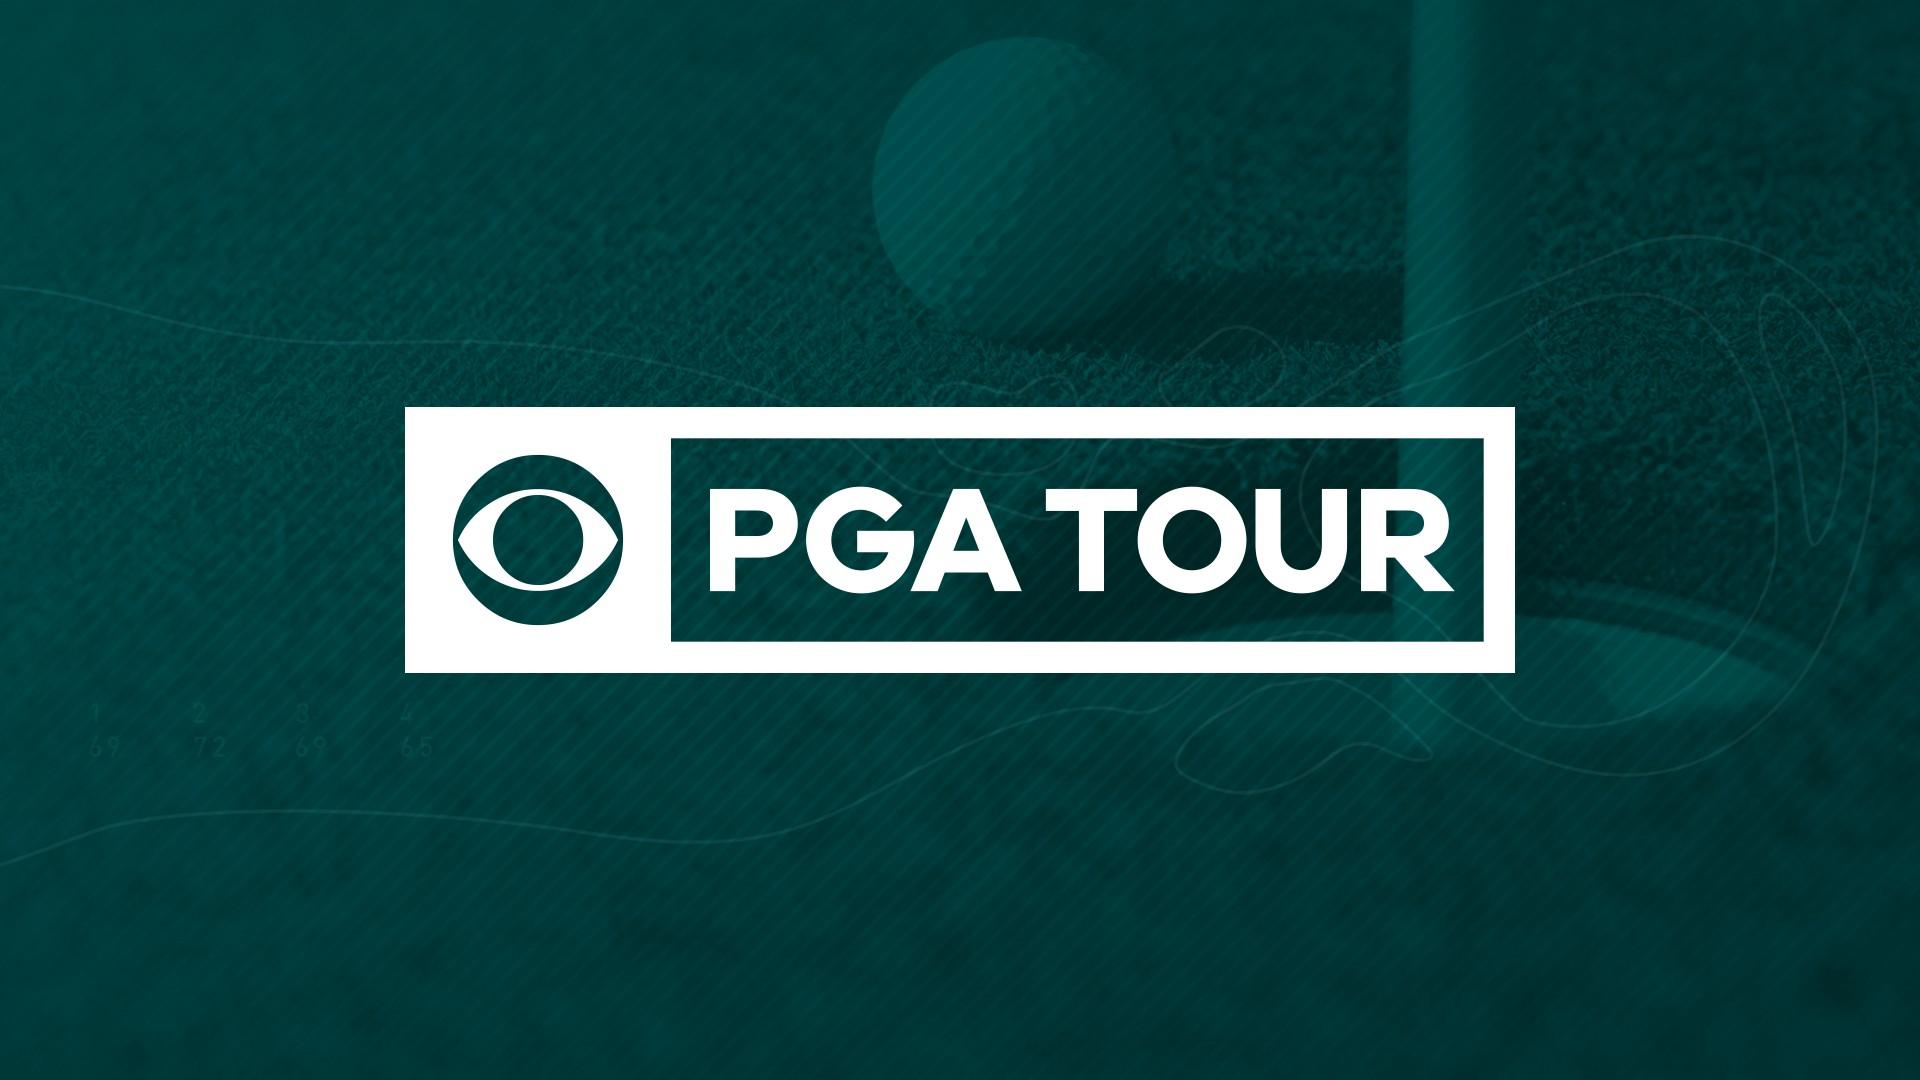 Watch CBS PGA TOUR The Northern Trust CBSSports CBSSports